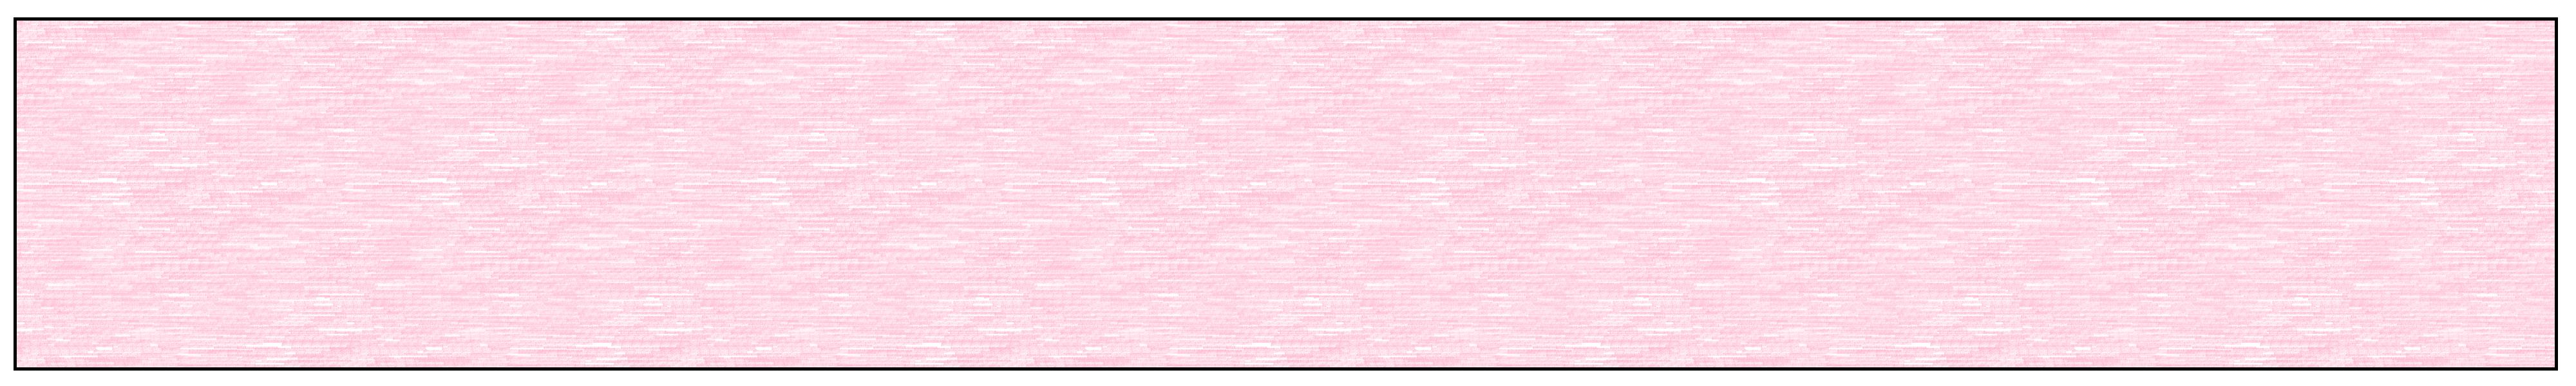 Pink banner